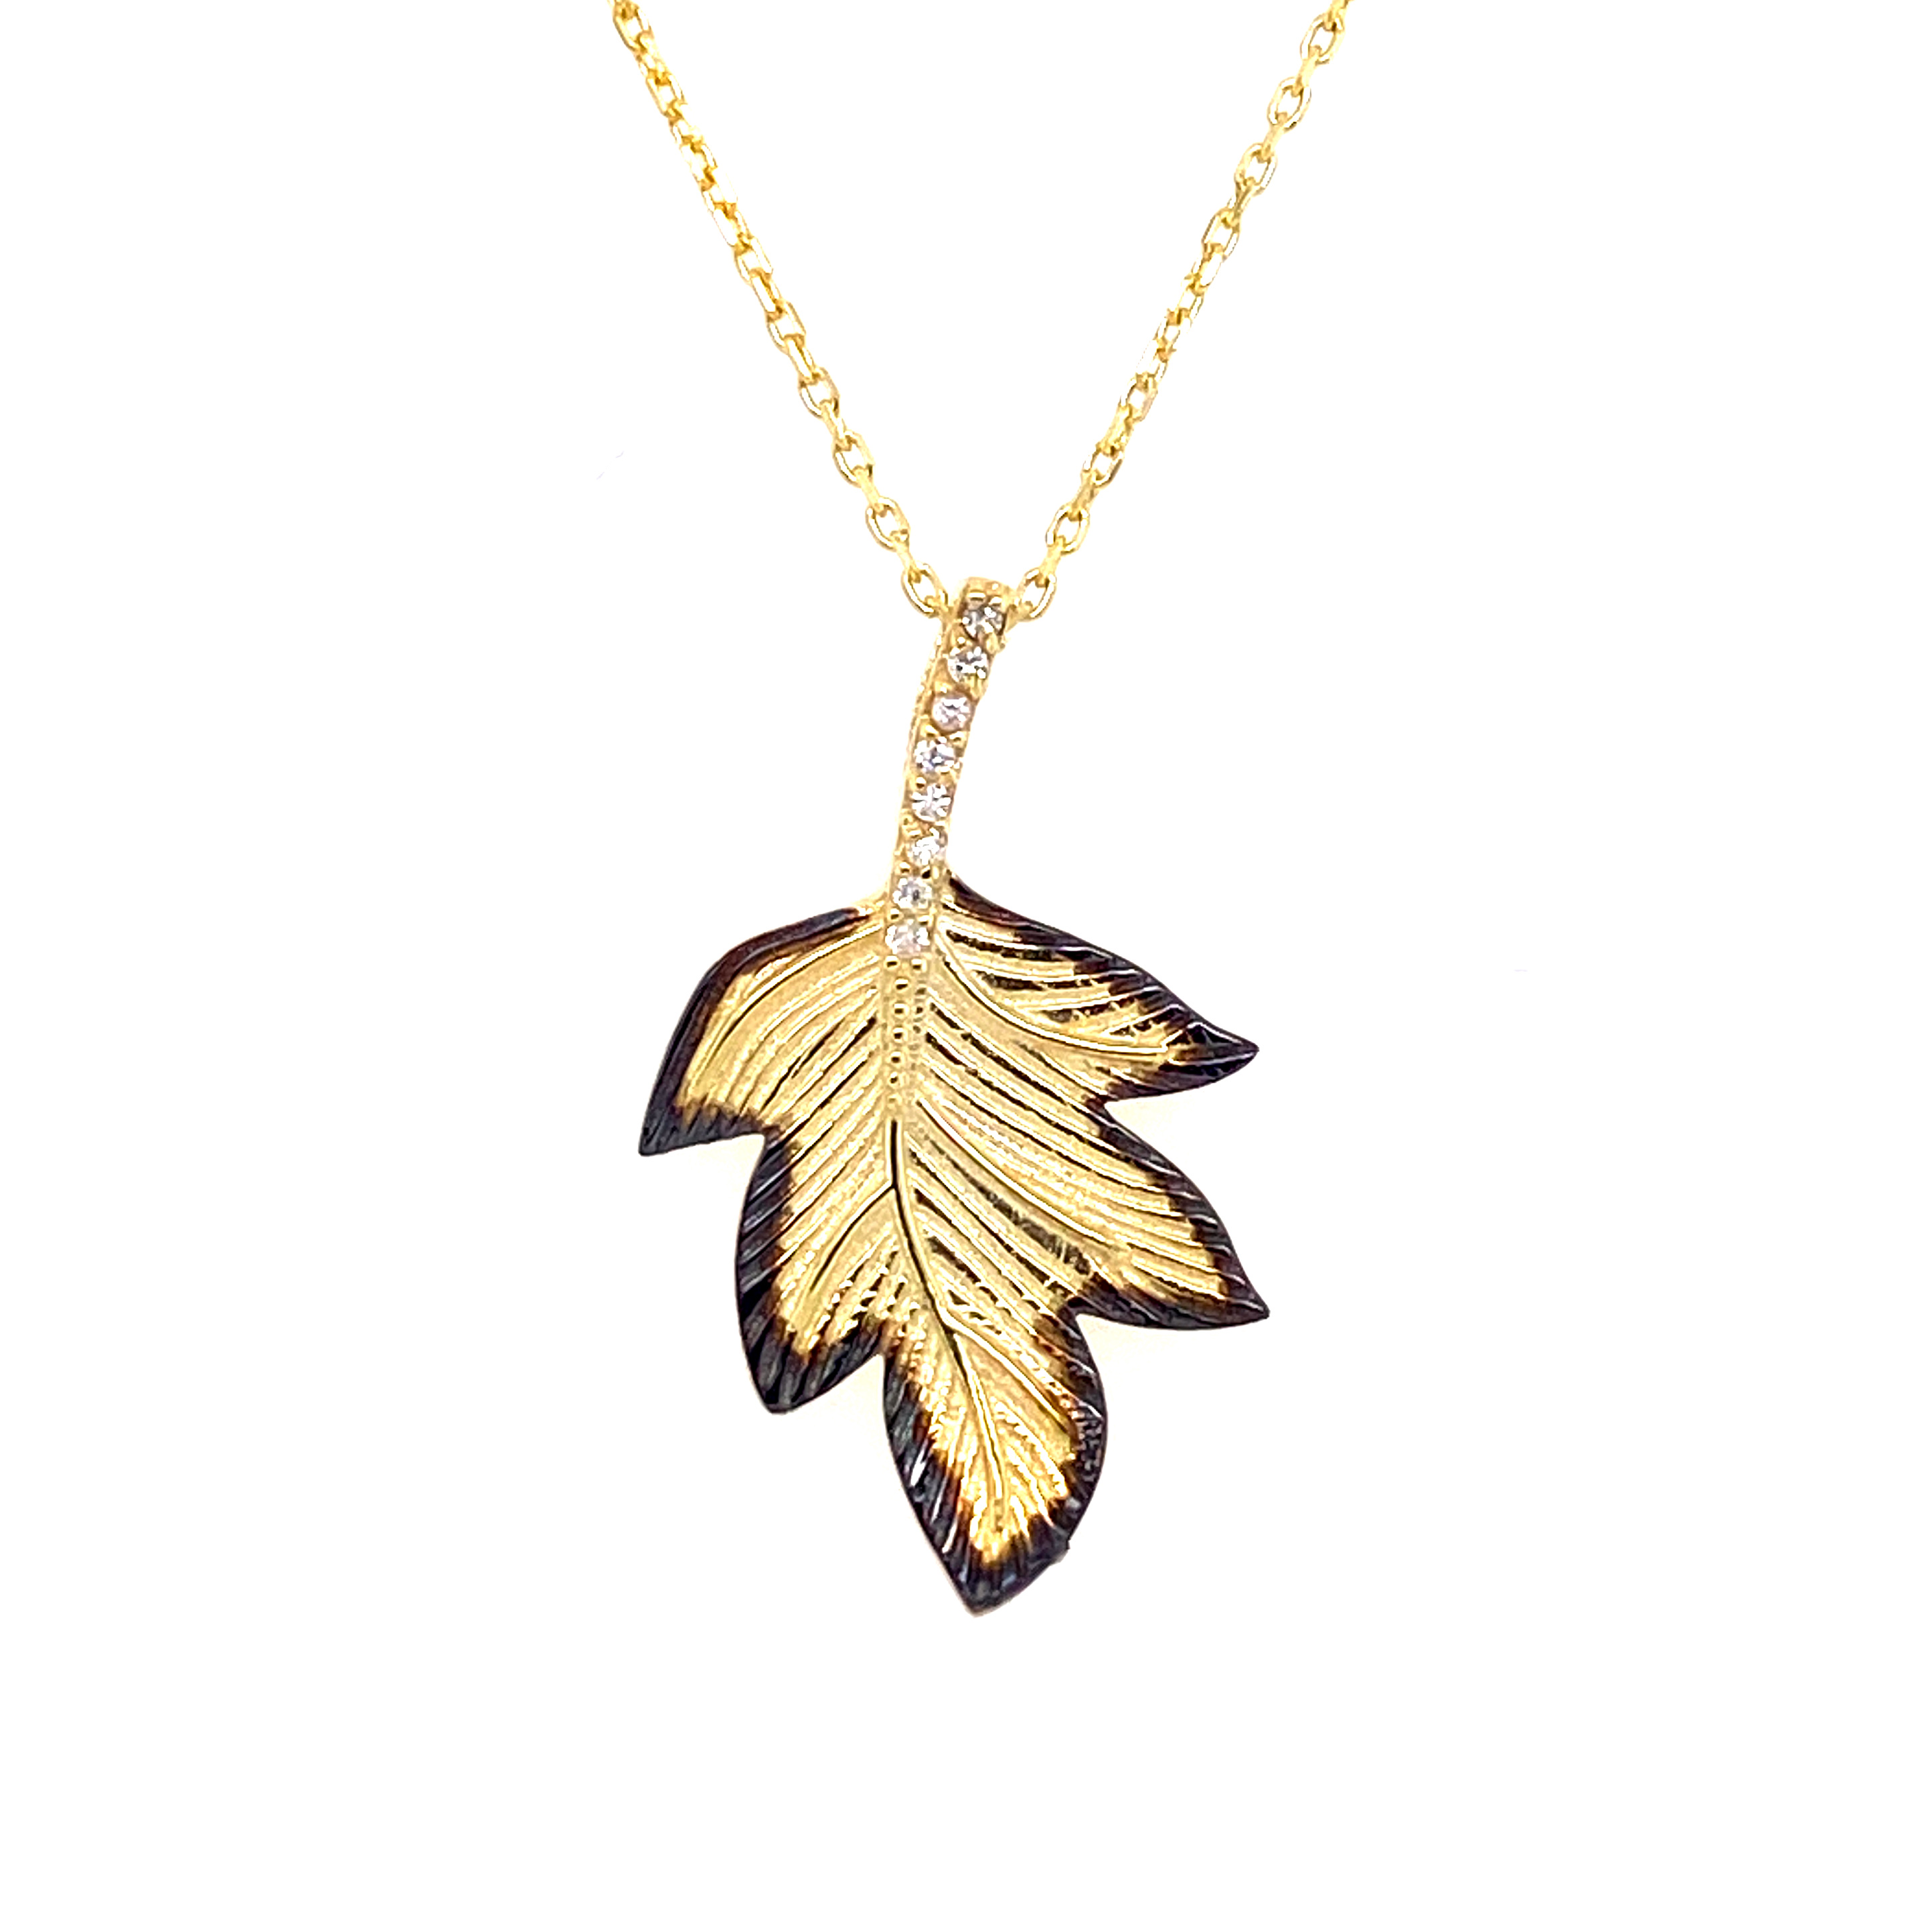 925 Silber Halskette | Blatt Zirkonia 2.0